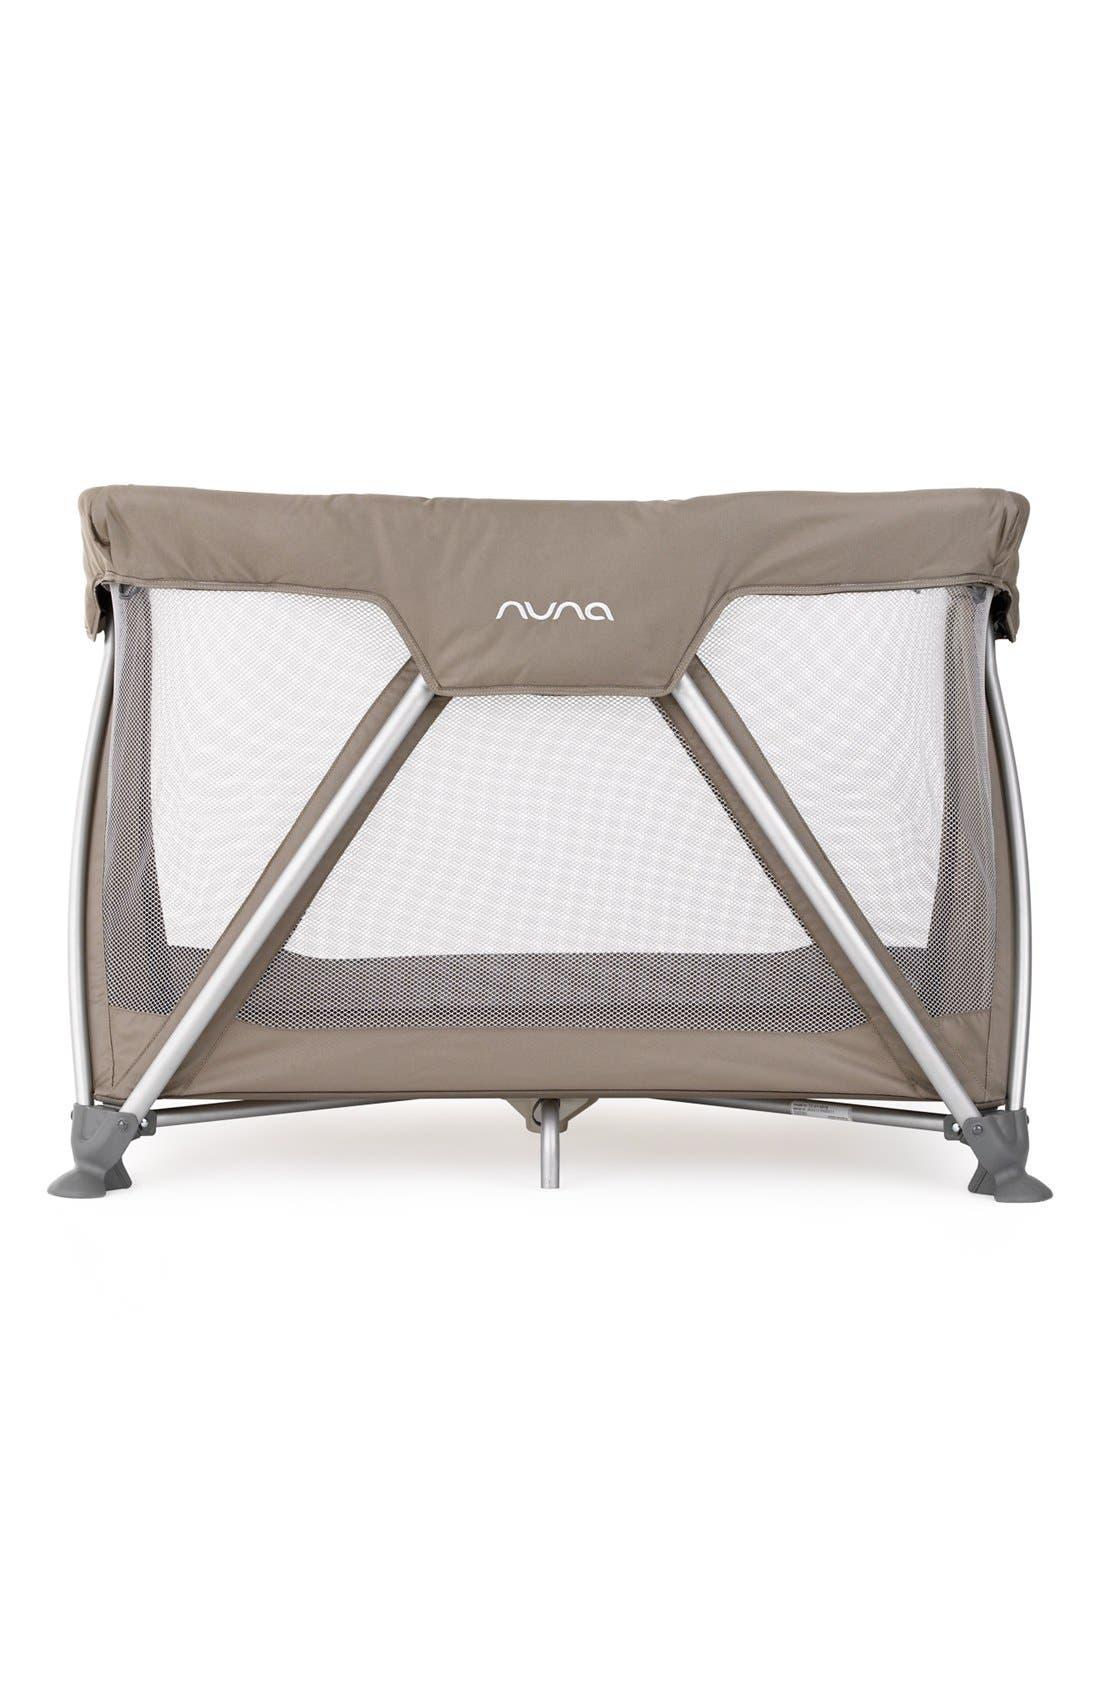 Main Image - nuna 'SENA™' Travel Crib (Online Only)